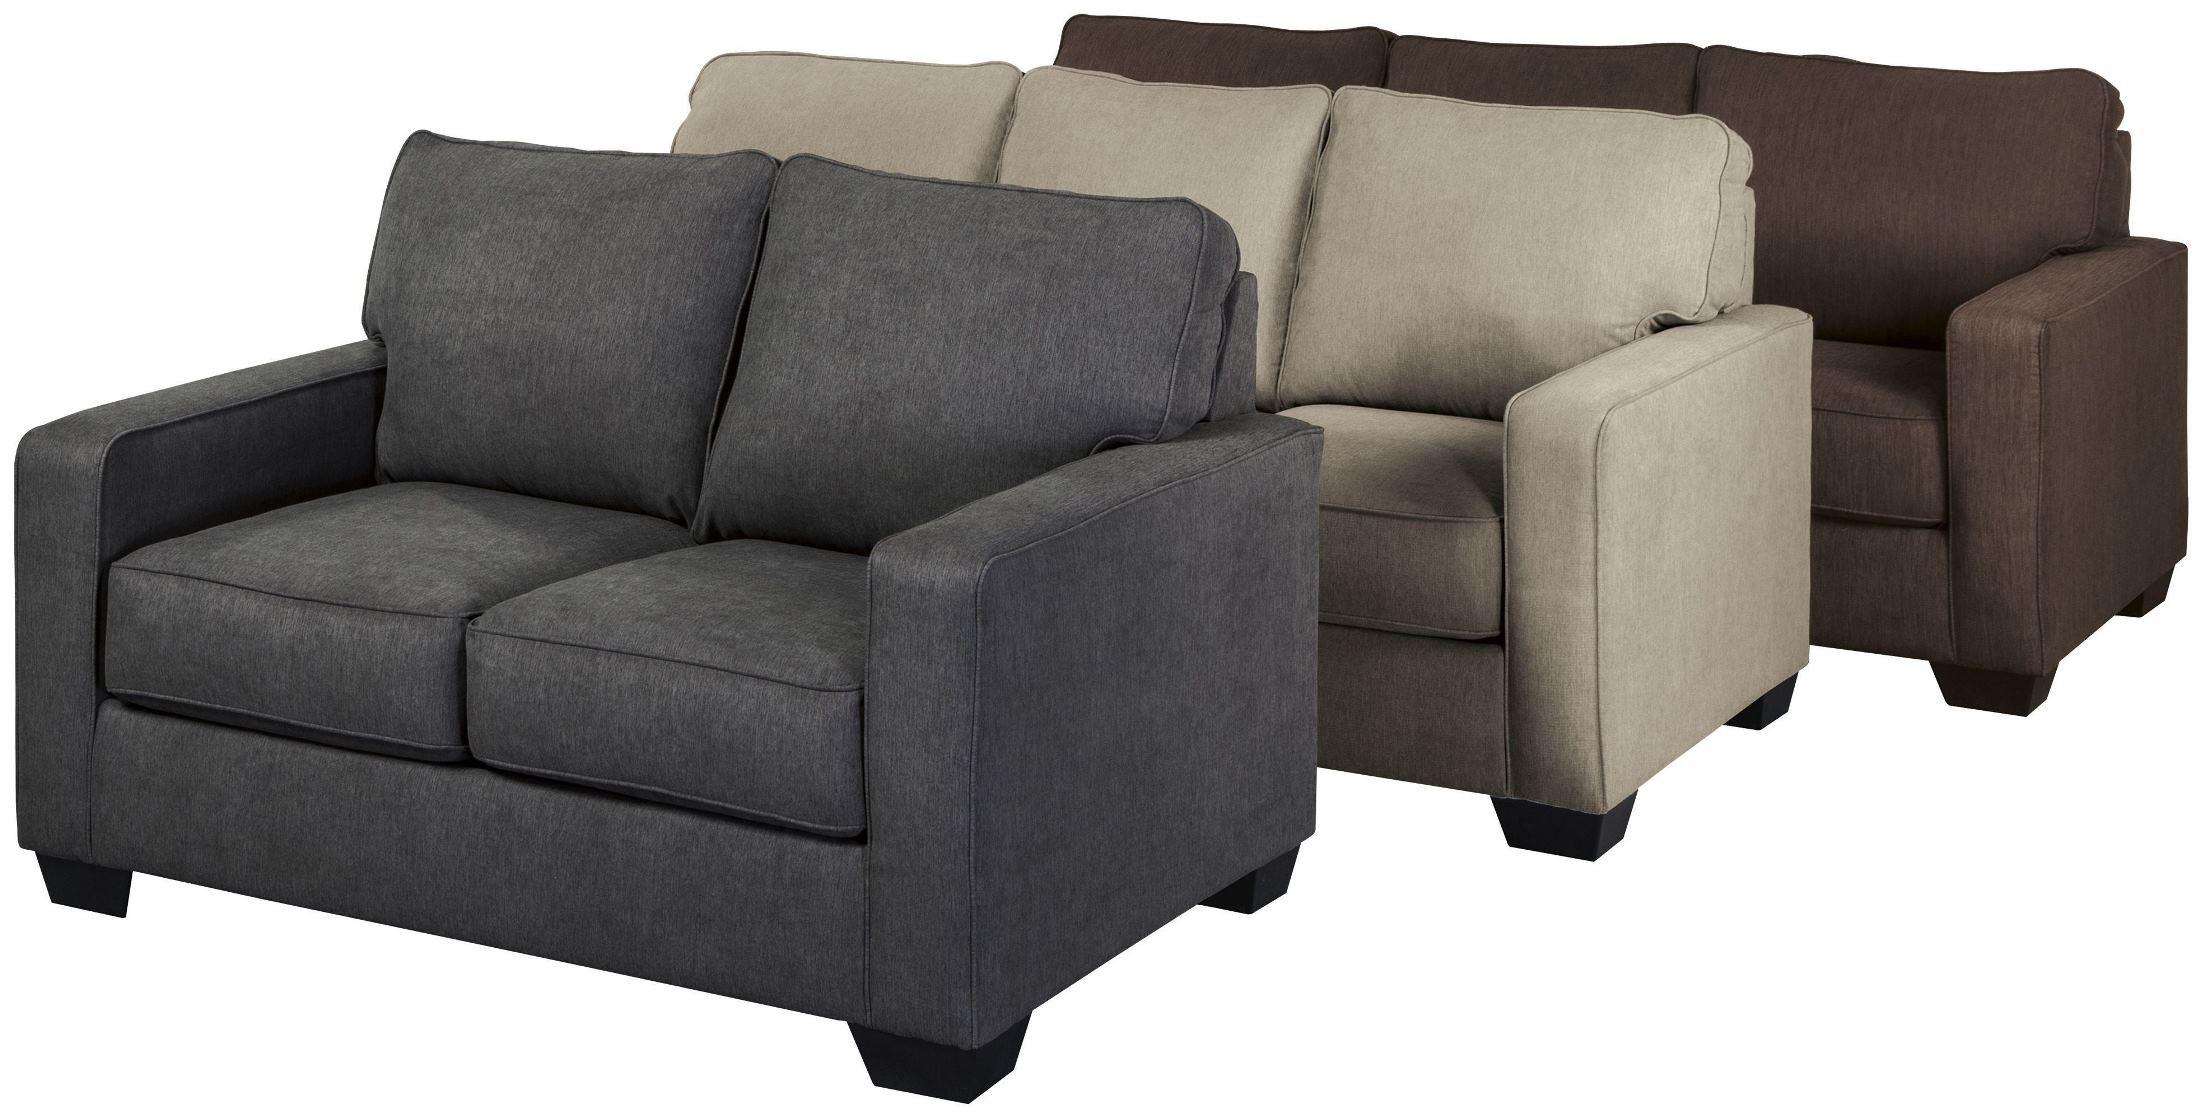 twin chair sleeper sofa antique morris chairs zeb charcoal 3590137 ashley